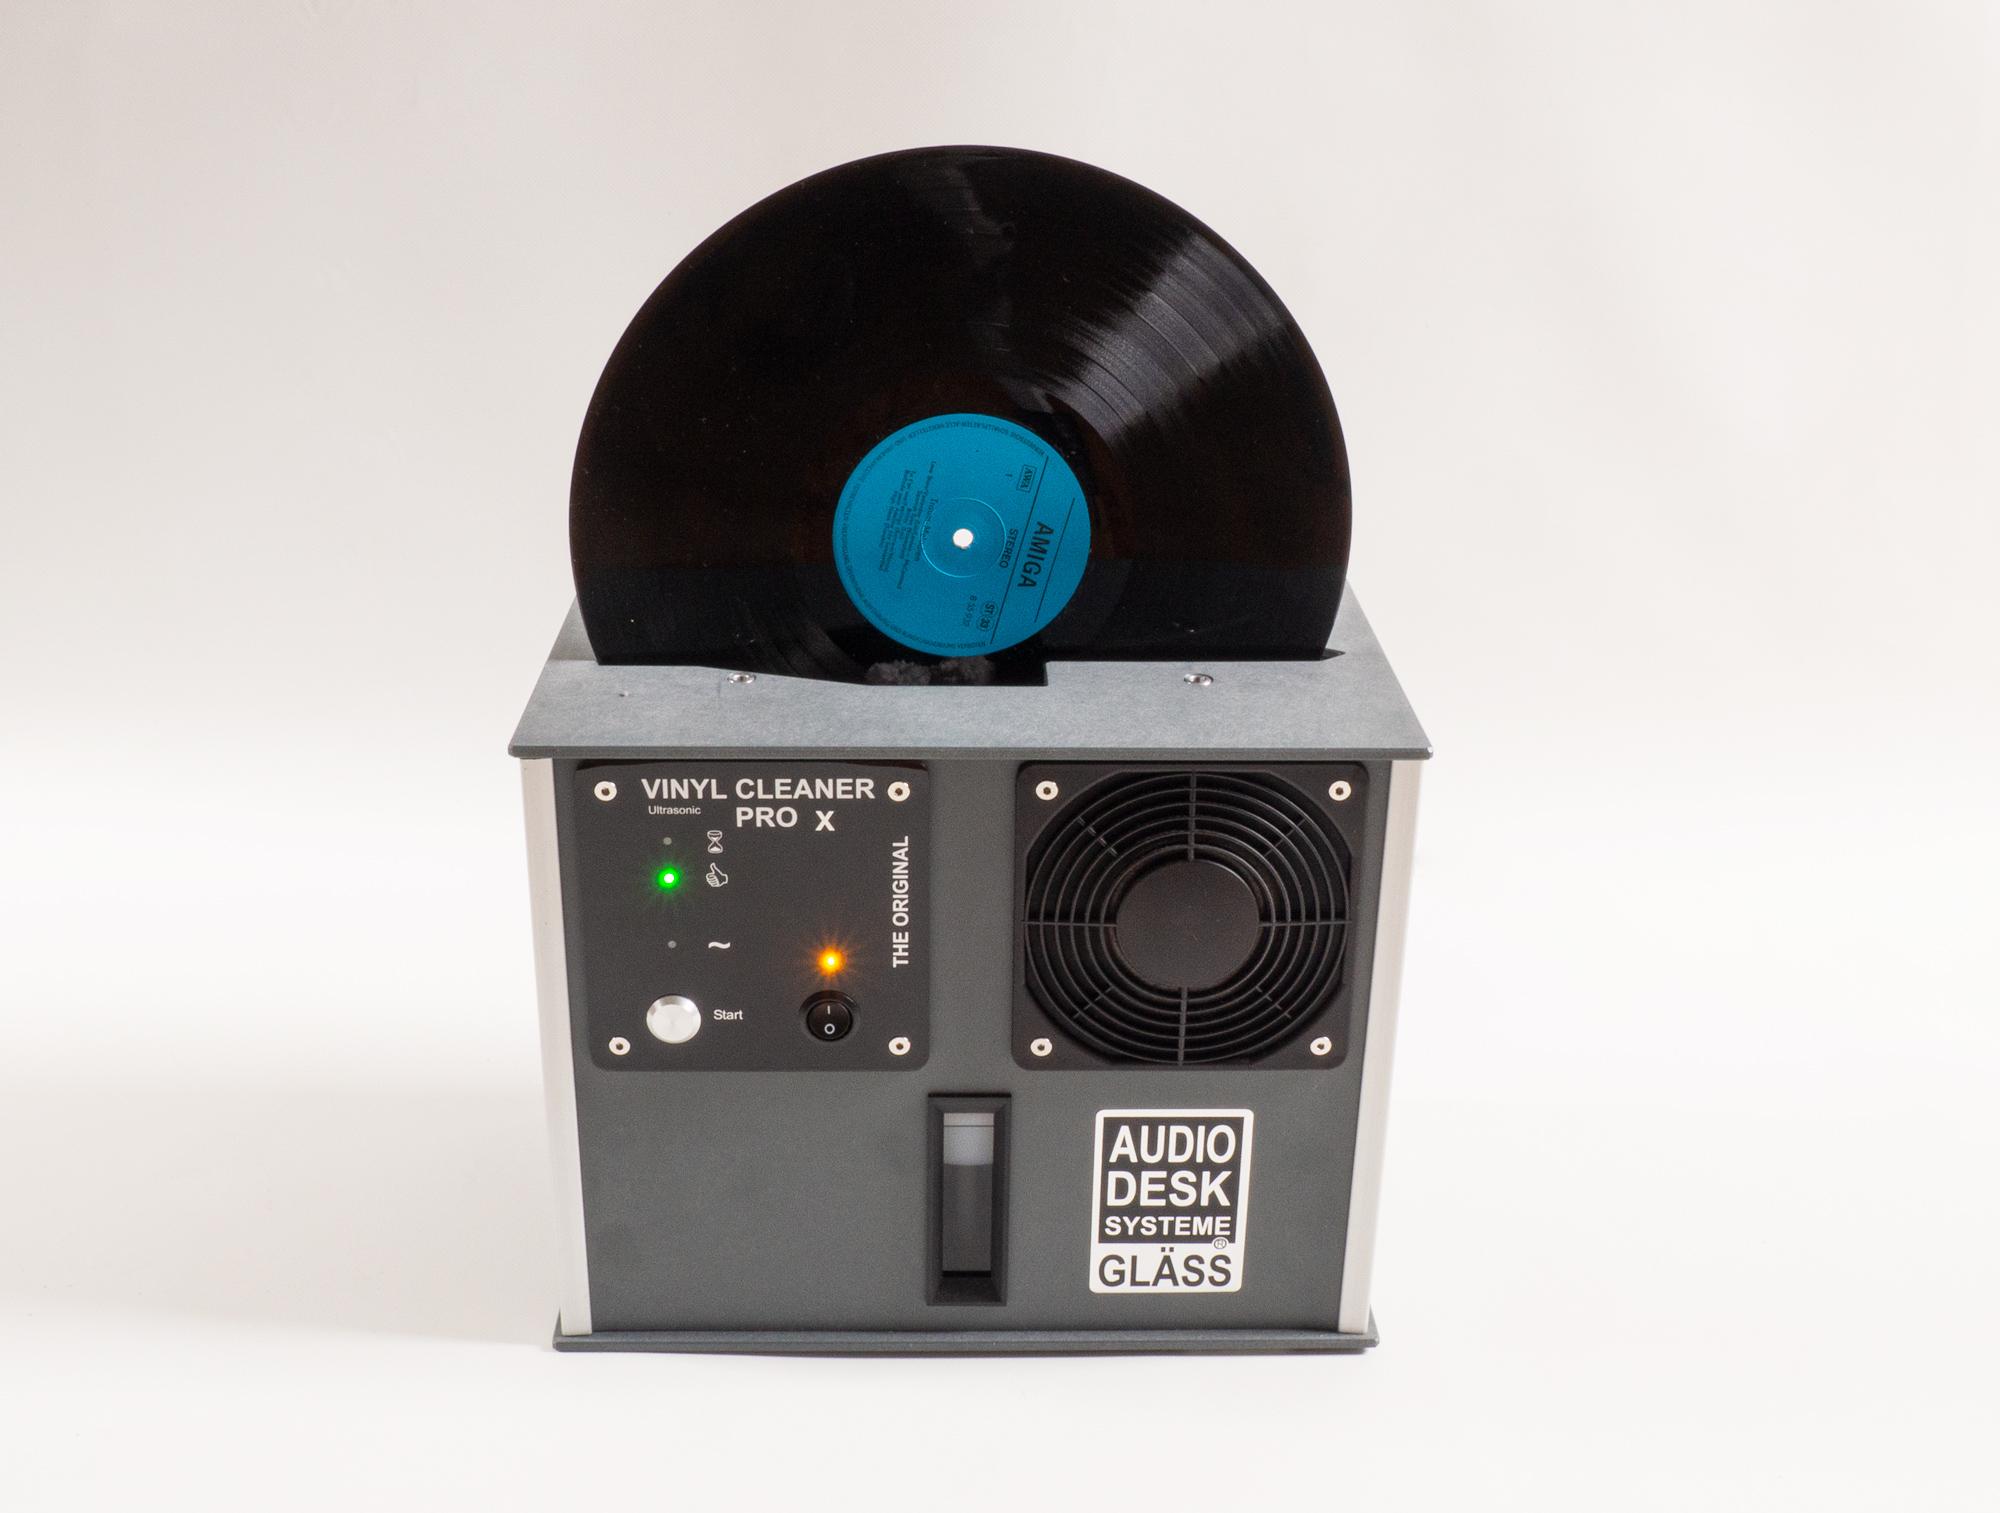 Gläss Vinyl Cleaner Pro X